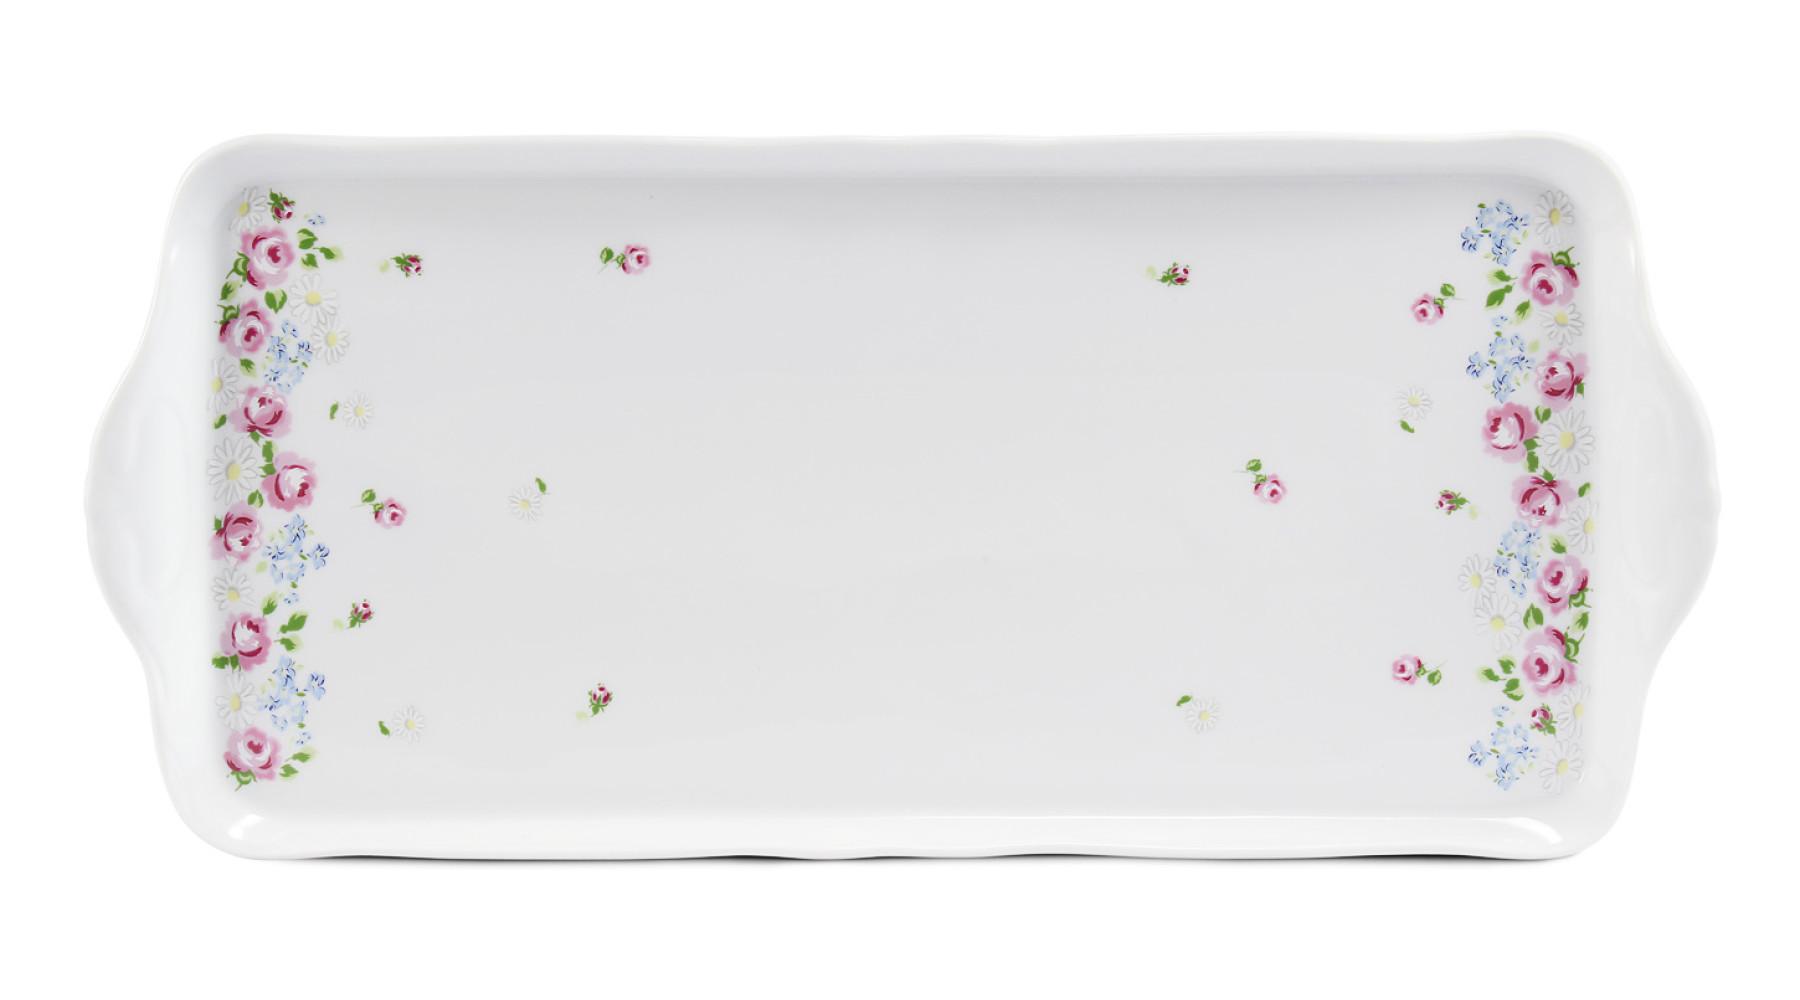 Podnos čtyřhranný 36 cm RoseLine